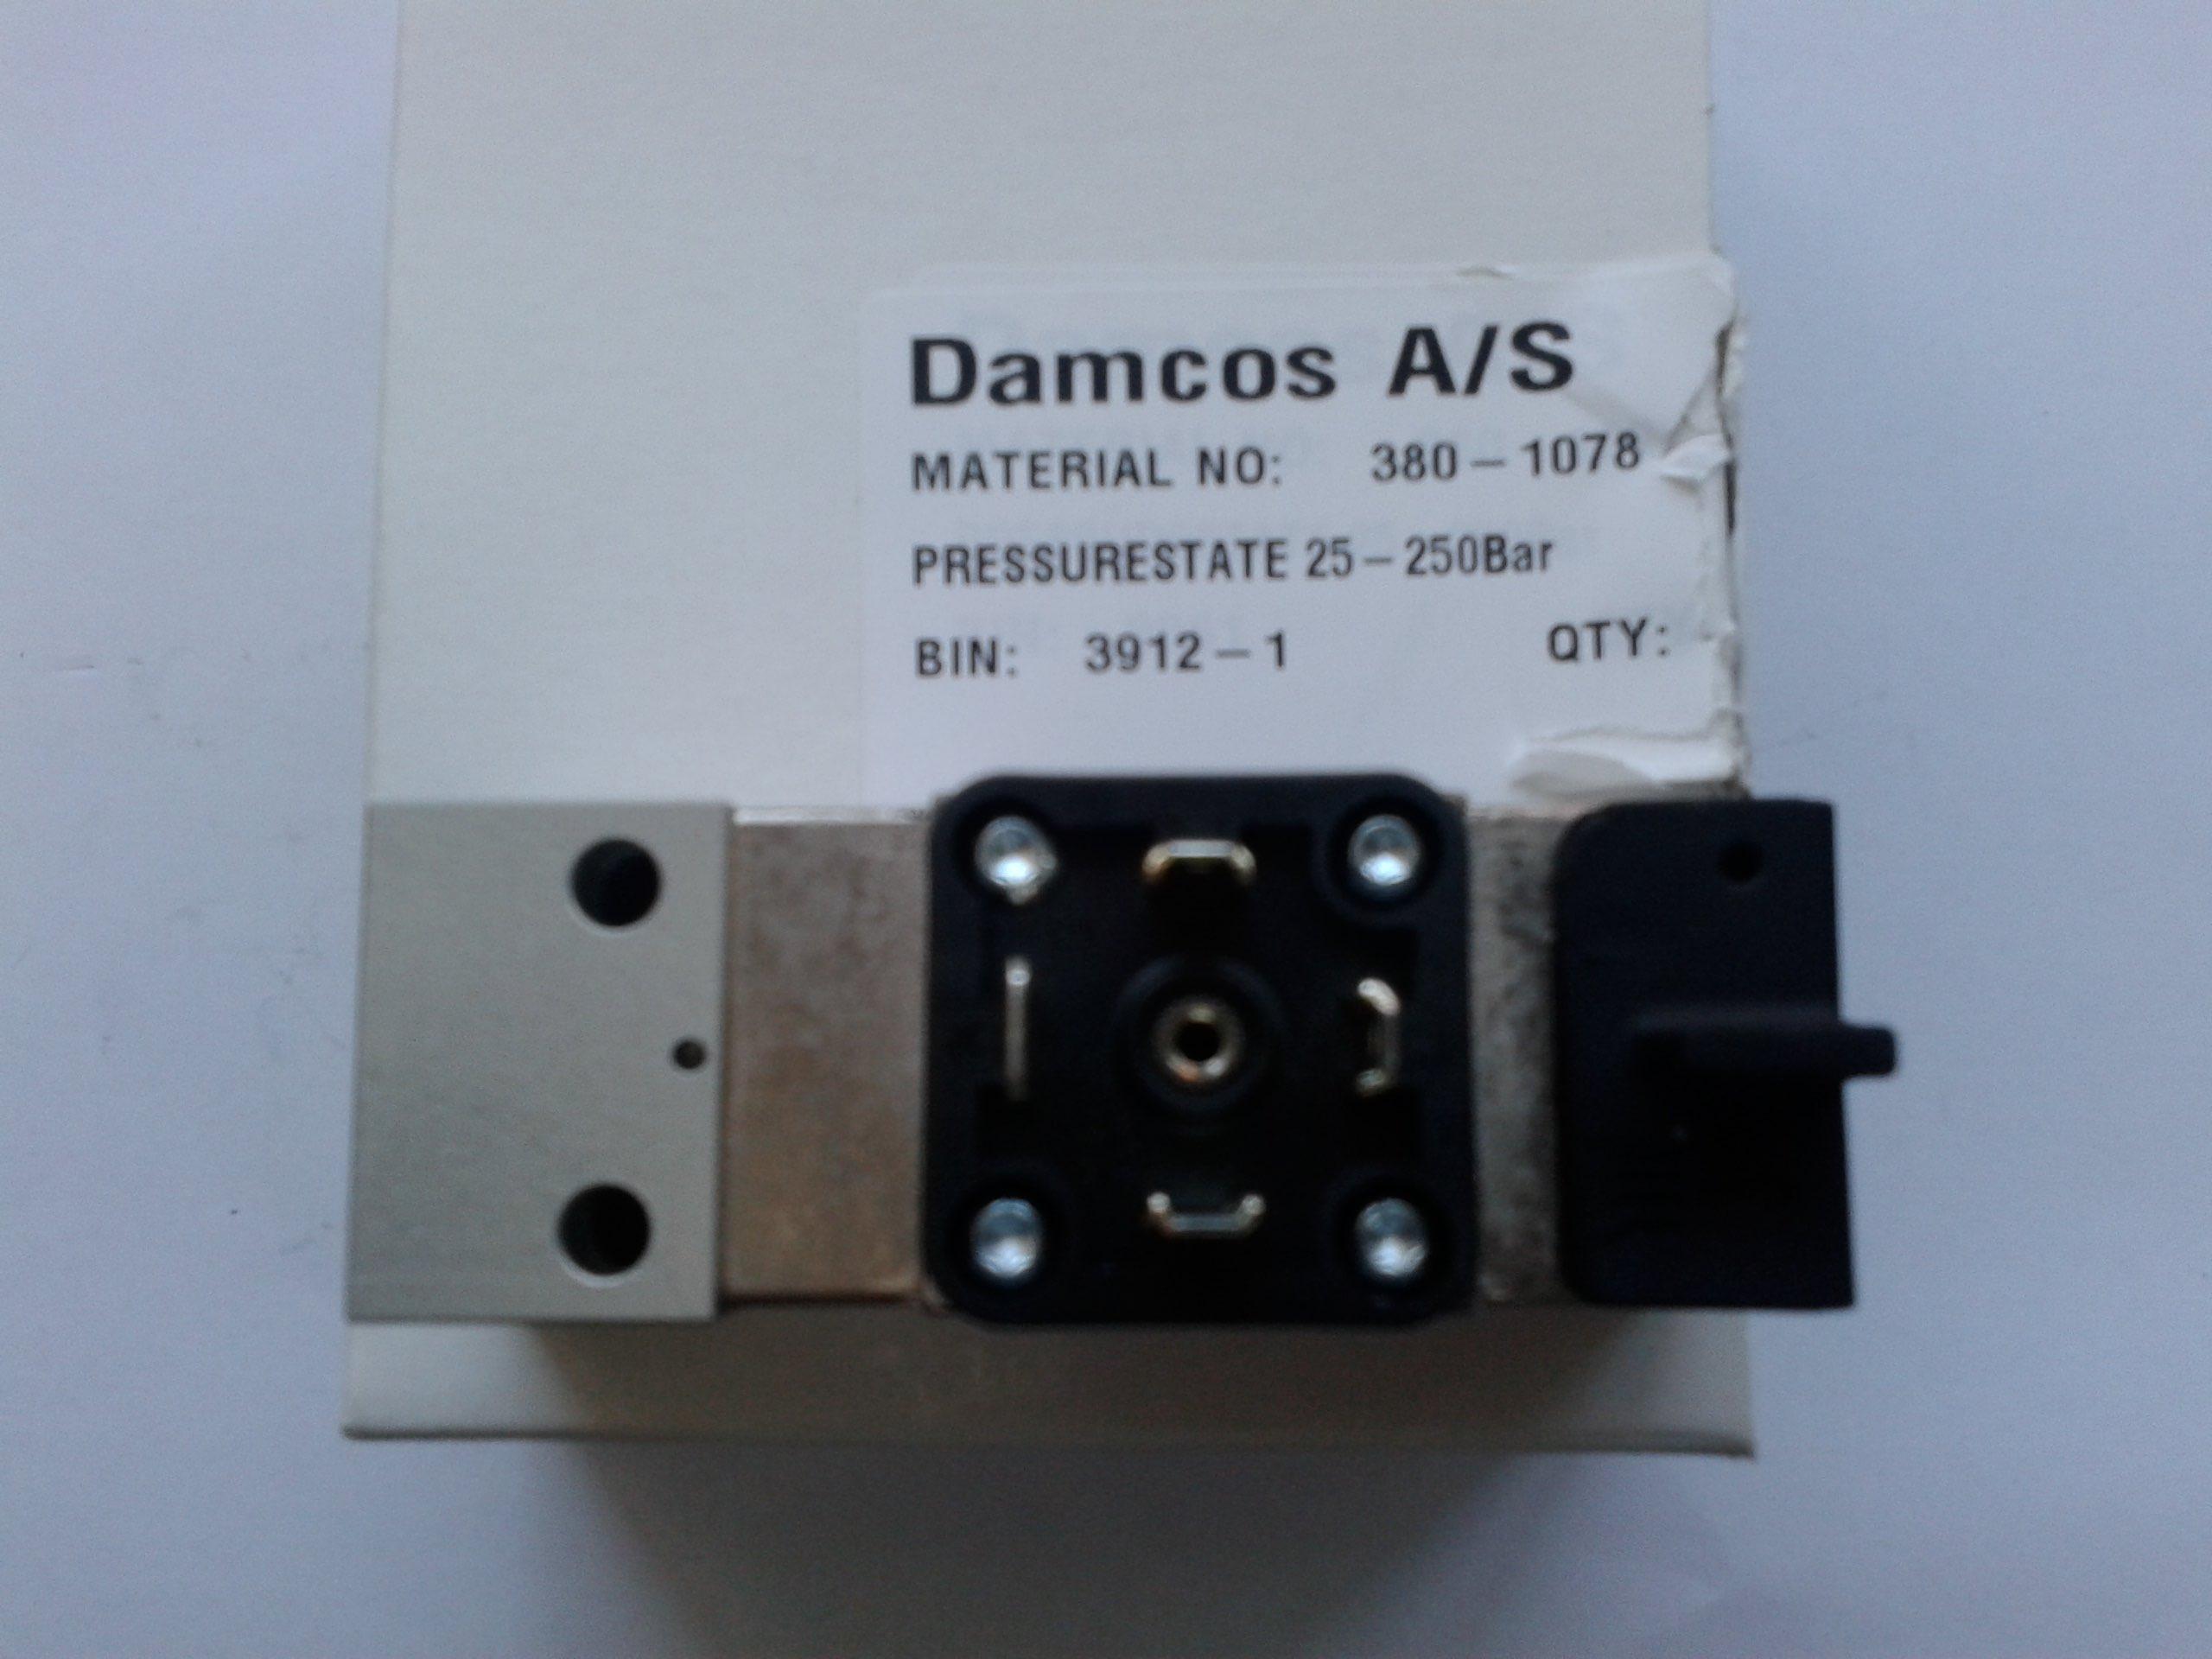 Damcos : Danfoss 380-1078 Pressurestate 25-250 Bar image